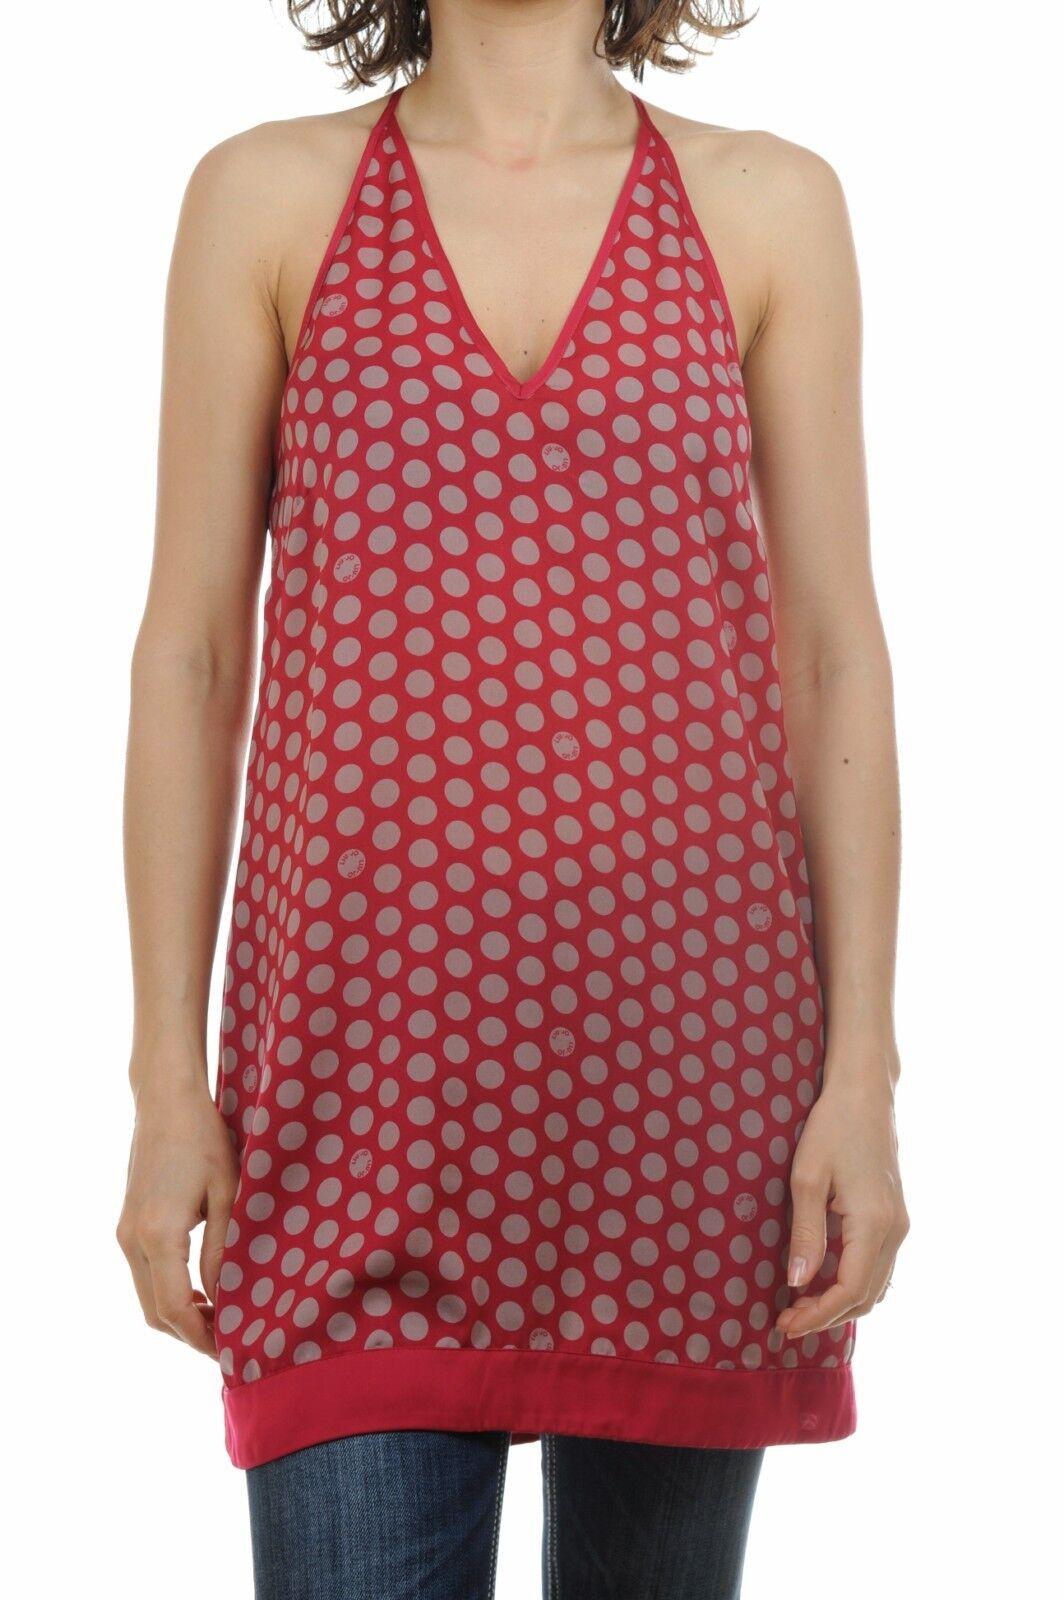 Liu-Jo - Topwear-Top - frau - rouge - 681117C184505